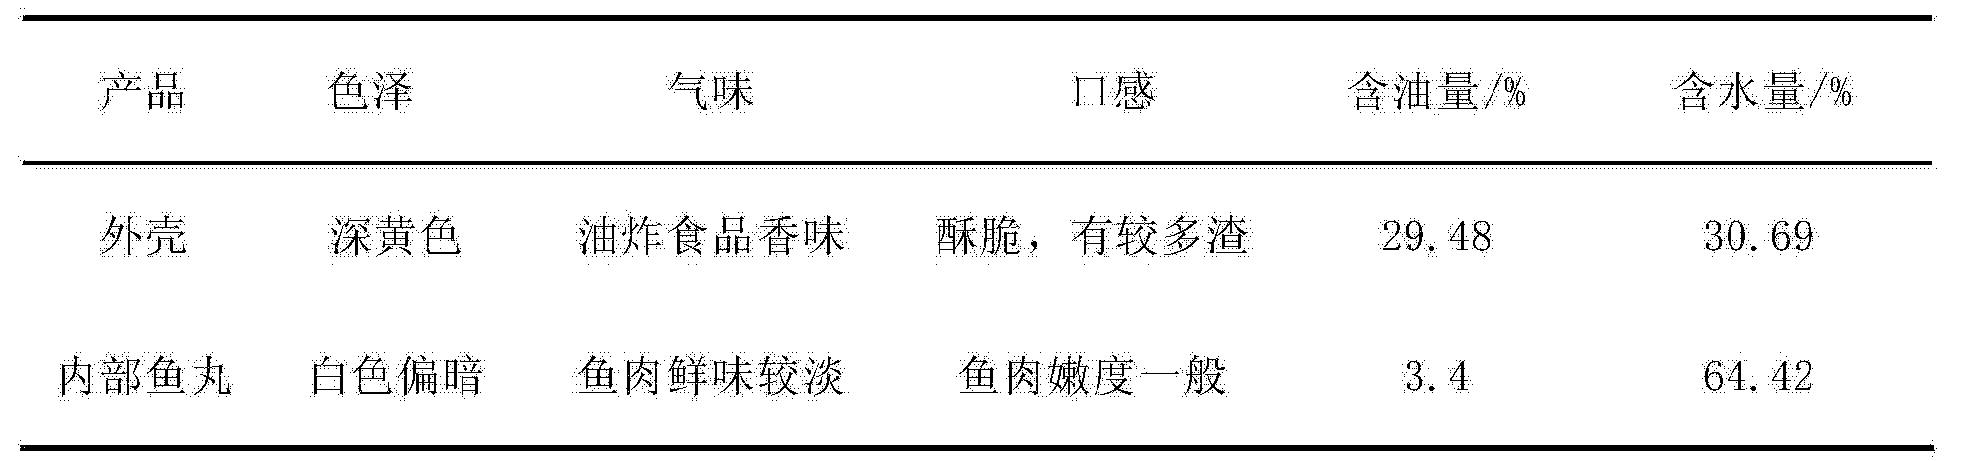 Figure CN104207152AD00081